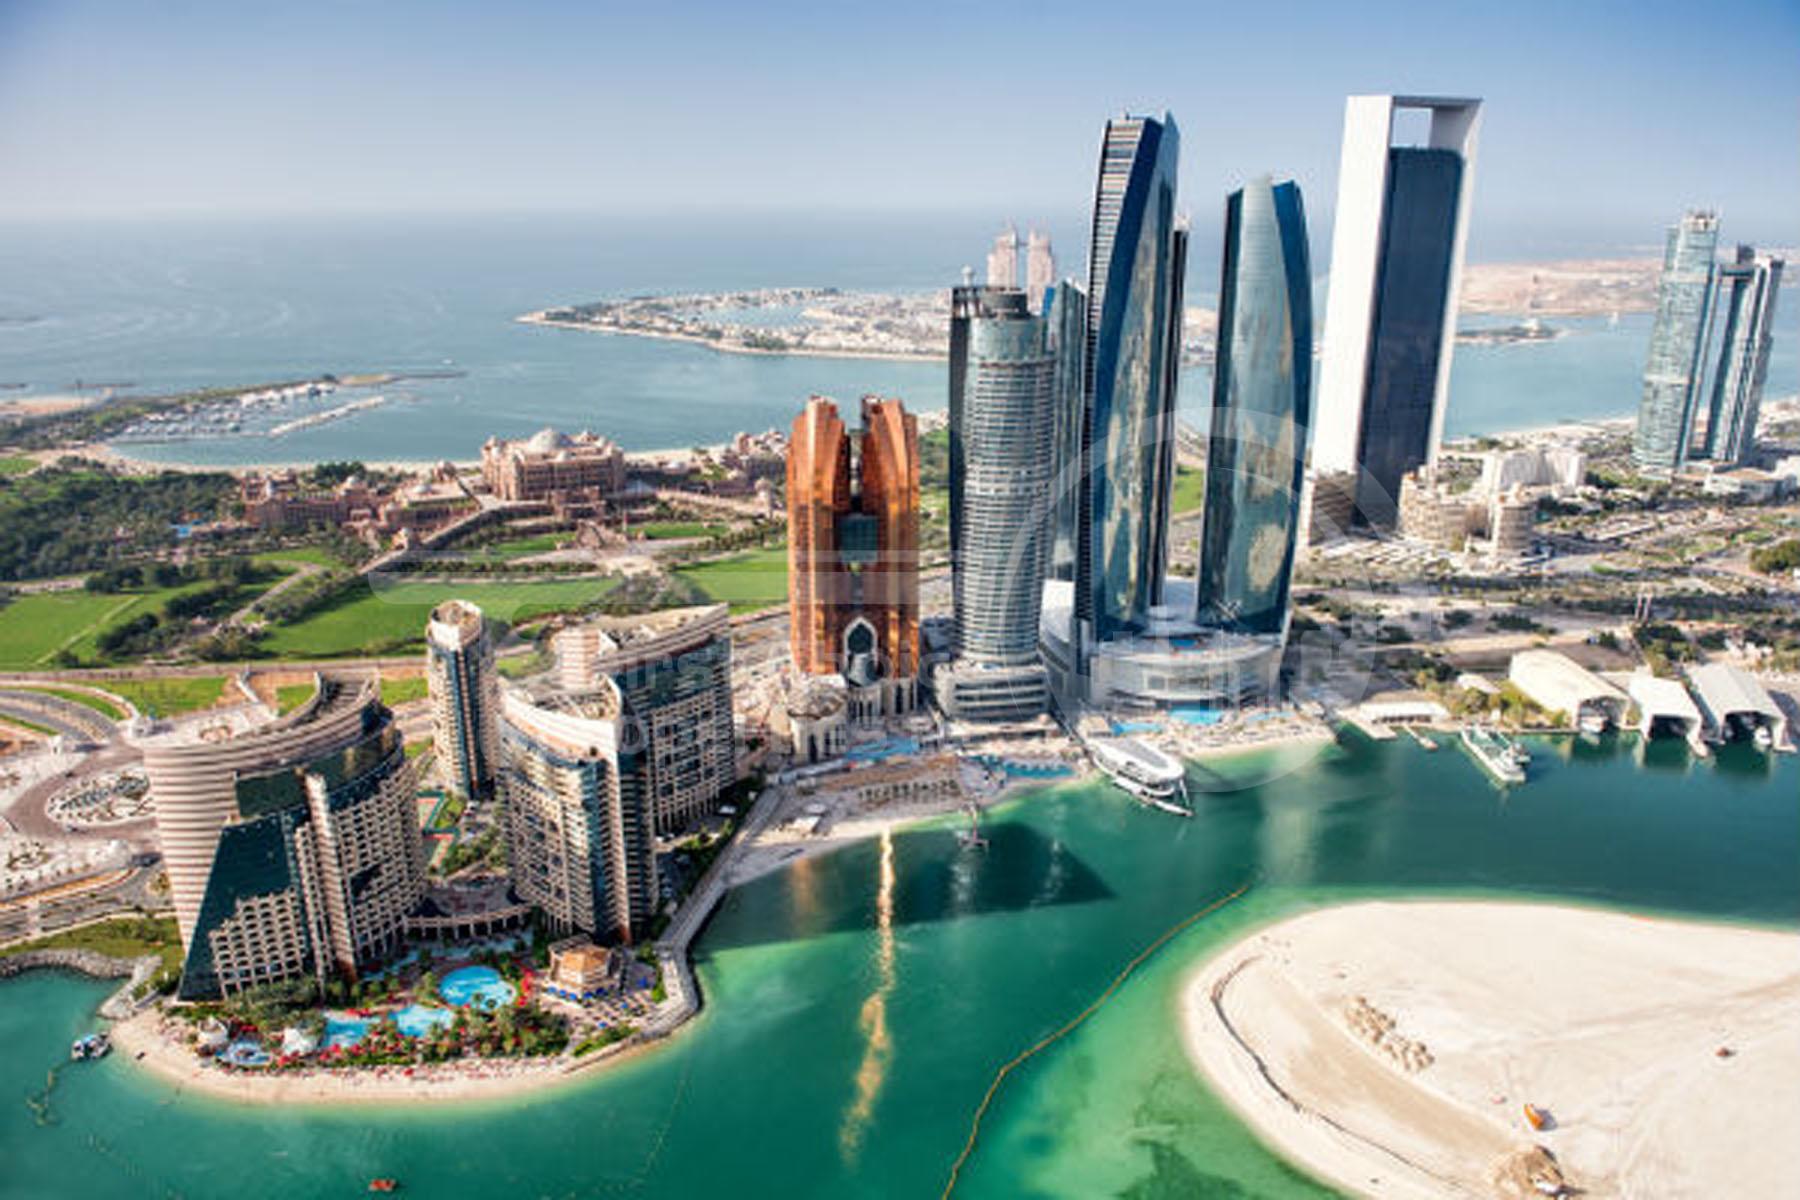 Residential Island - Nareel Island - Al Bateen - Abu Dhabi - UAE (7).jpg